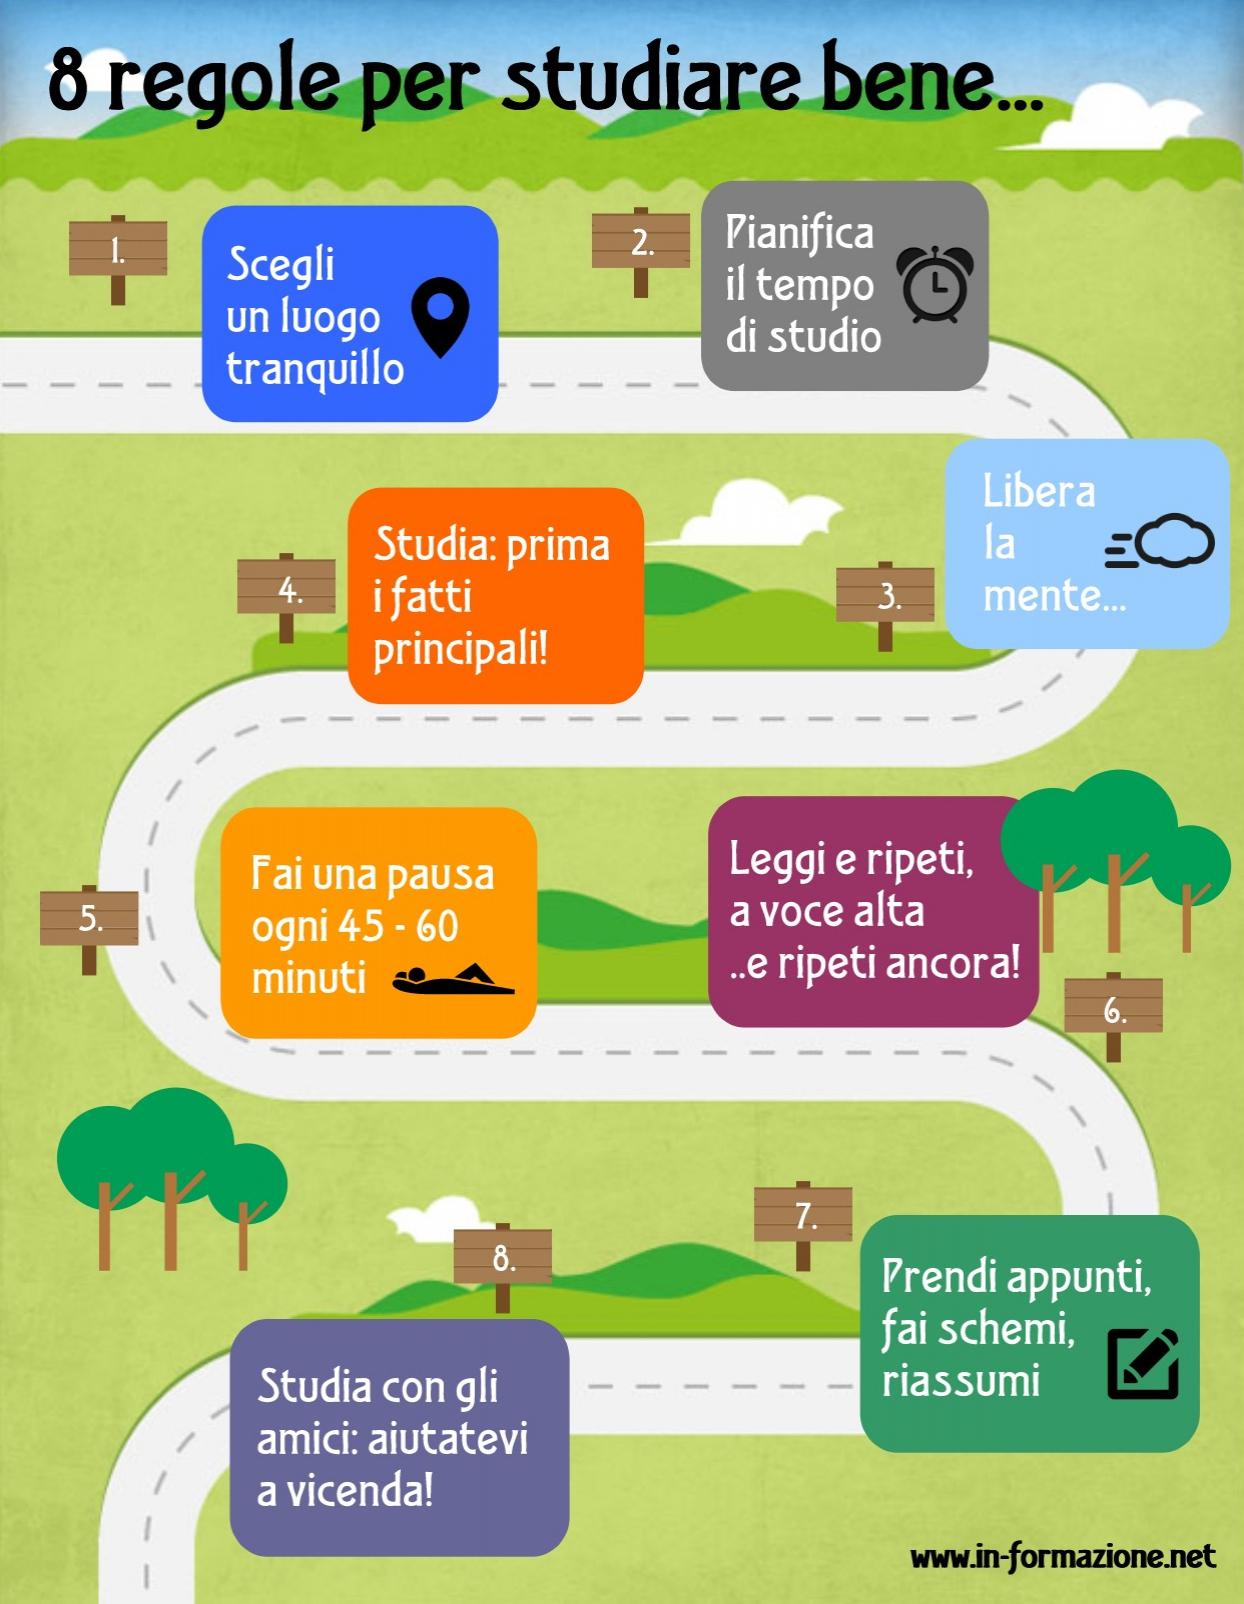 8 regole per studiare bene – infografica